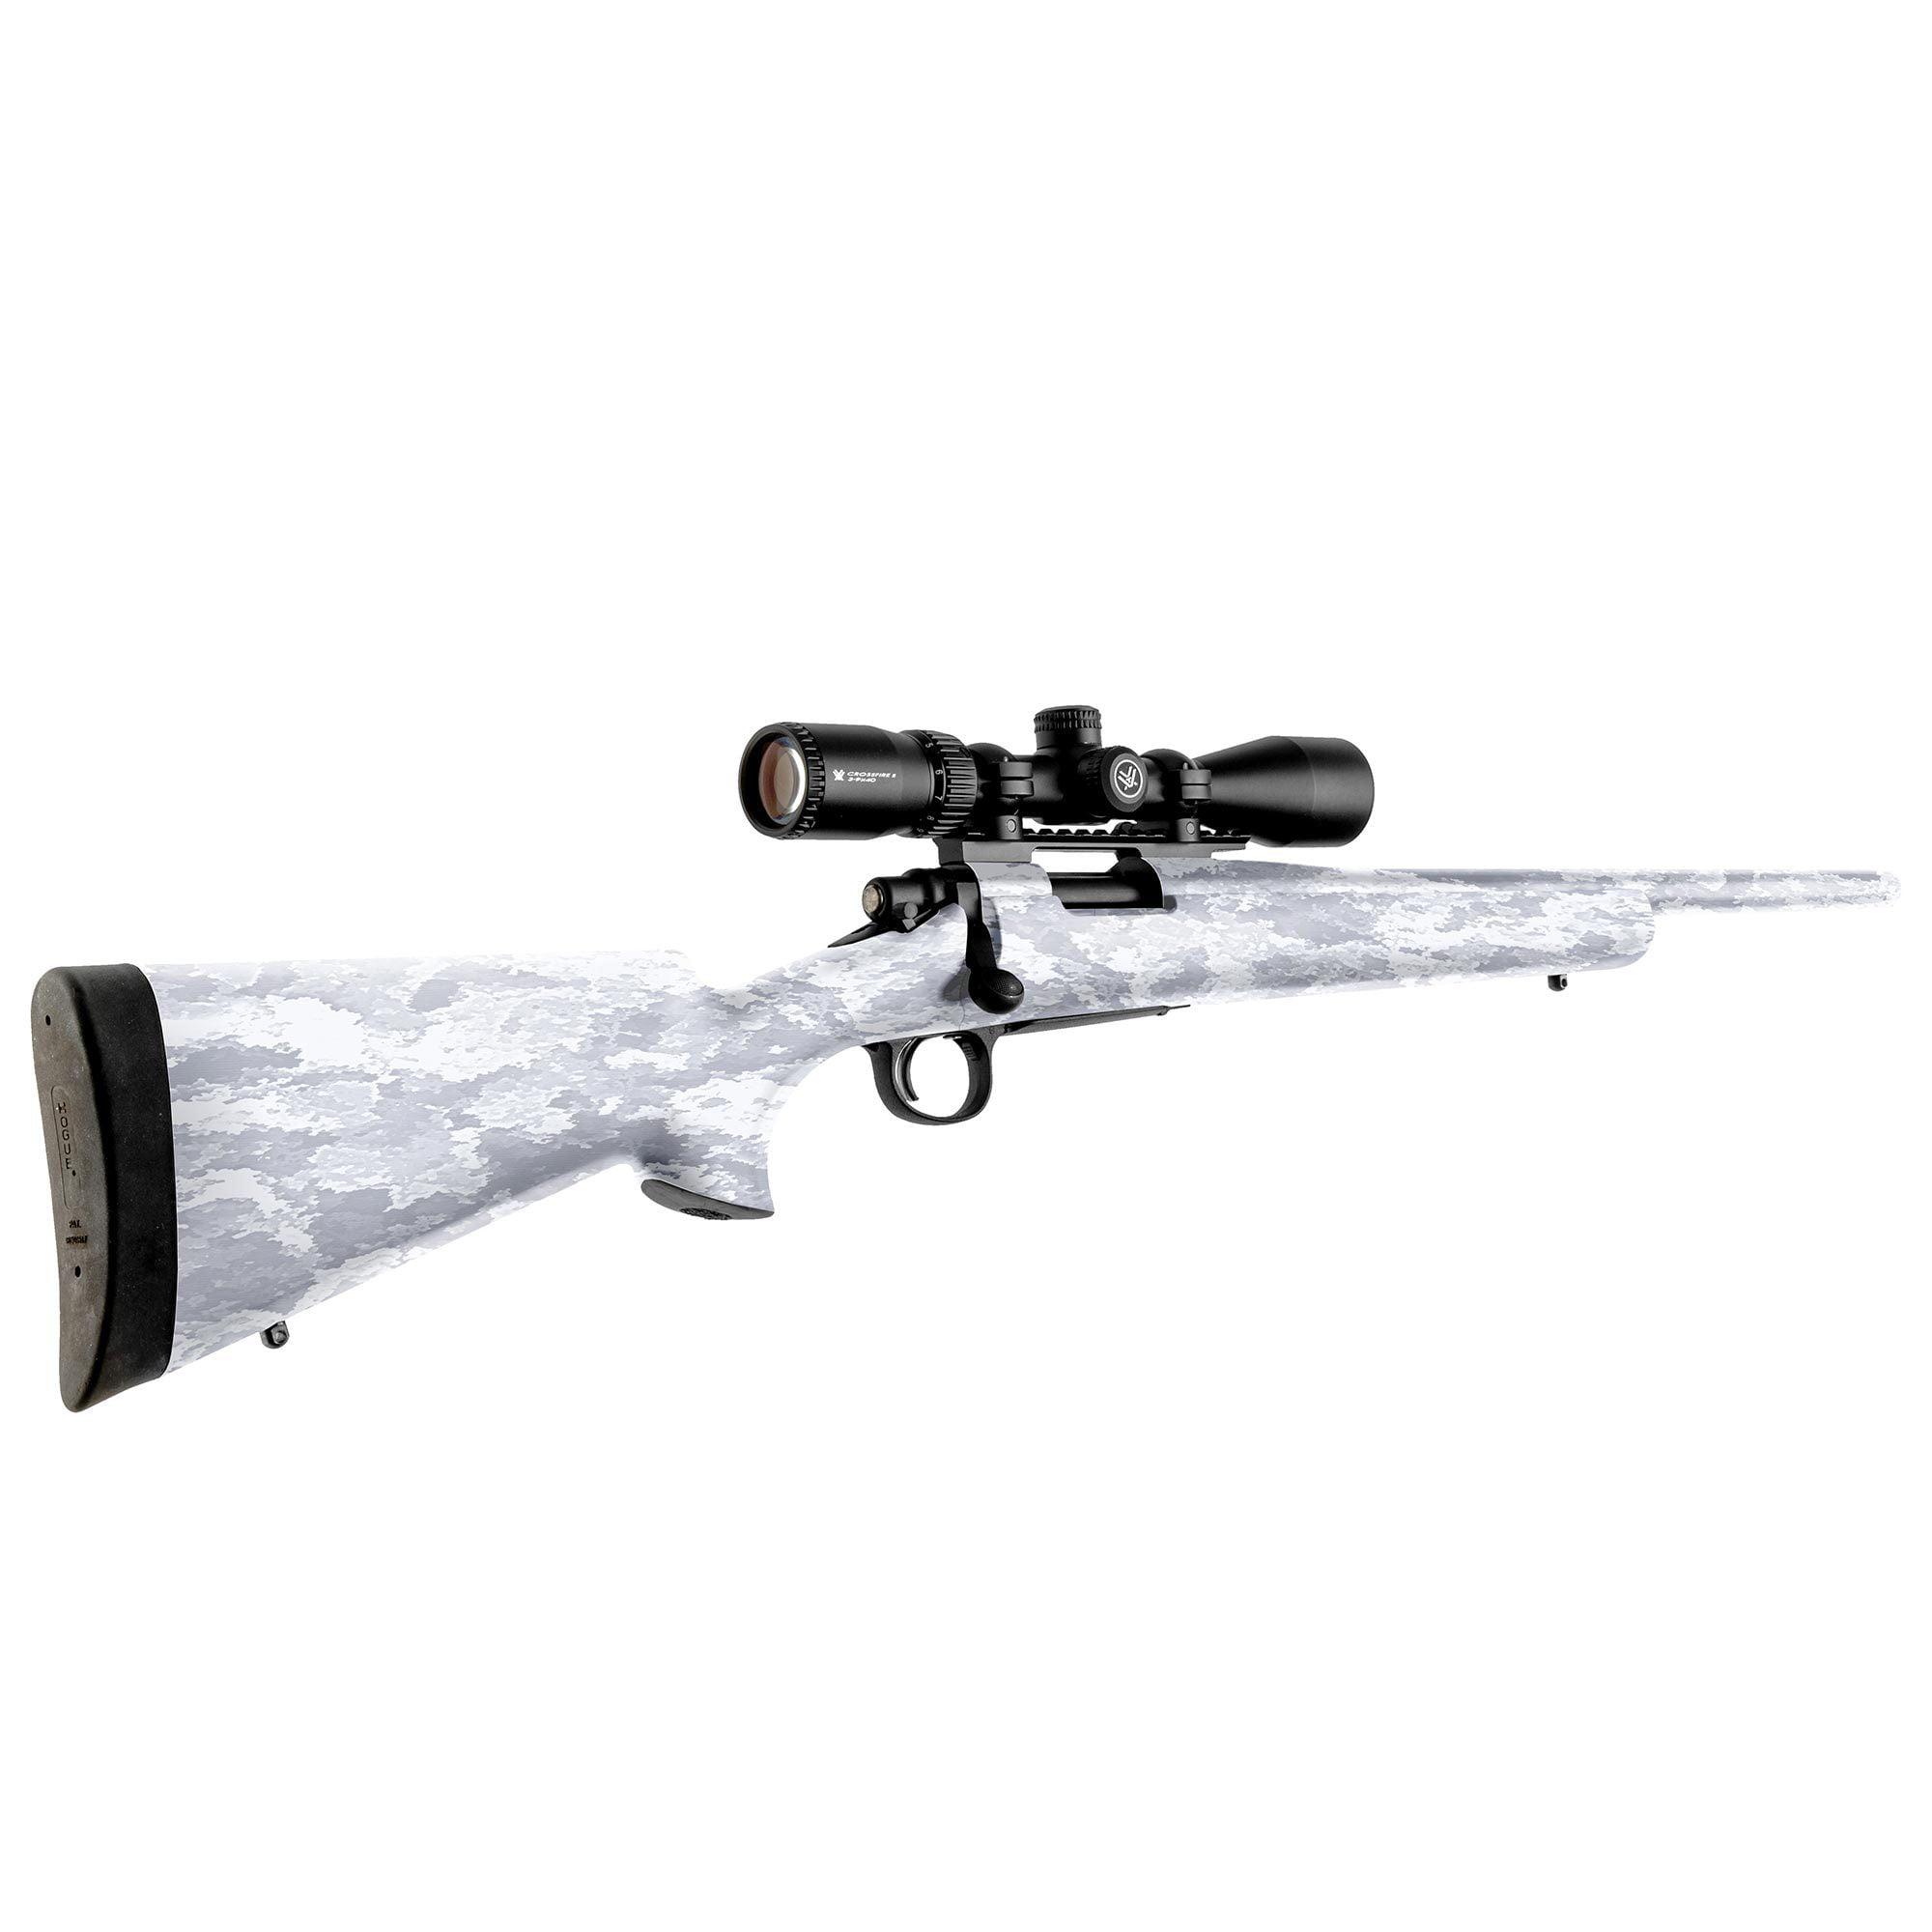 aa682a90a5de3 GunSkins Hunting/Tactical Camouflage Rifle Skin DIY Vinyl Gun Wrap Kit -  Walmart.com